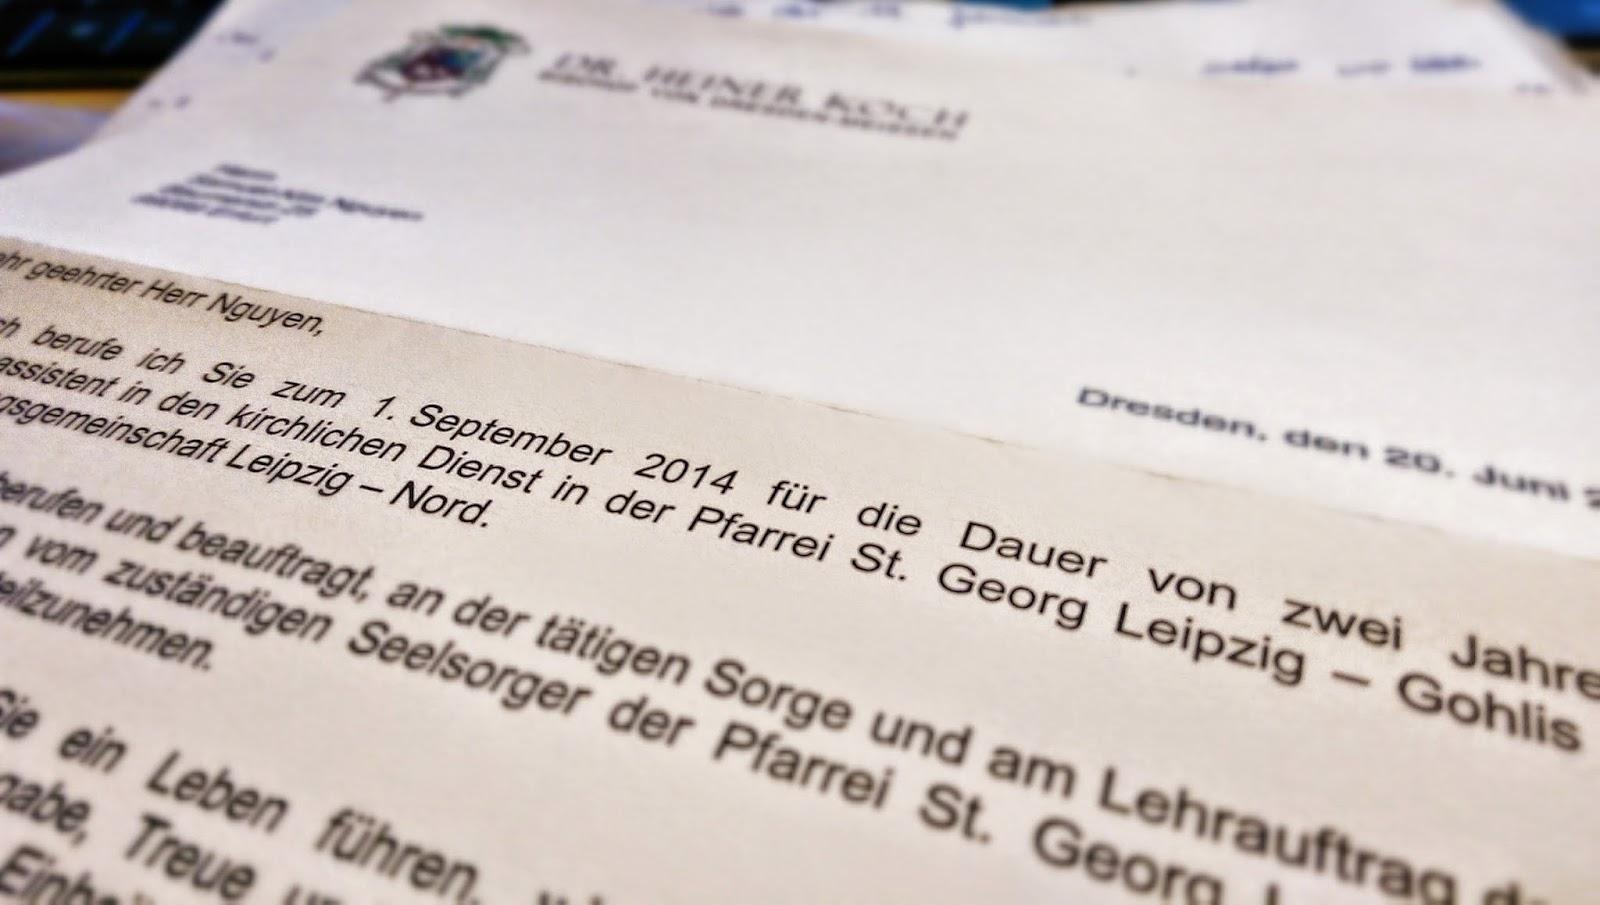 Leipzig-Gohlis, ich komme!